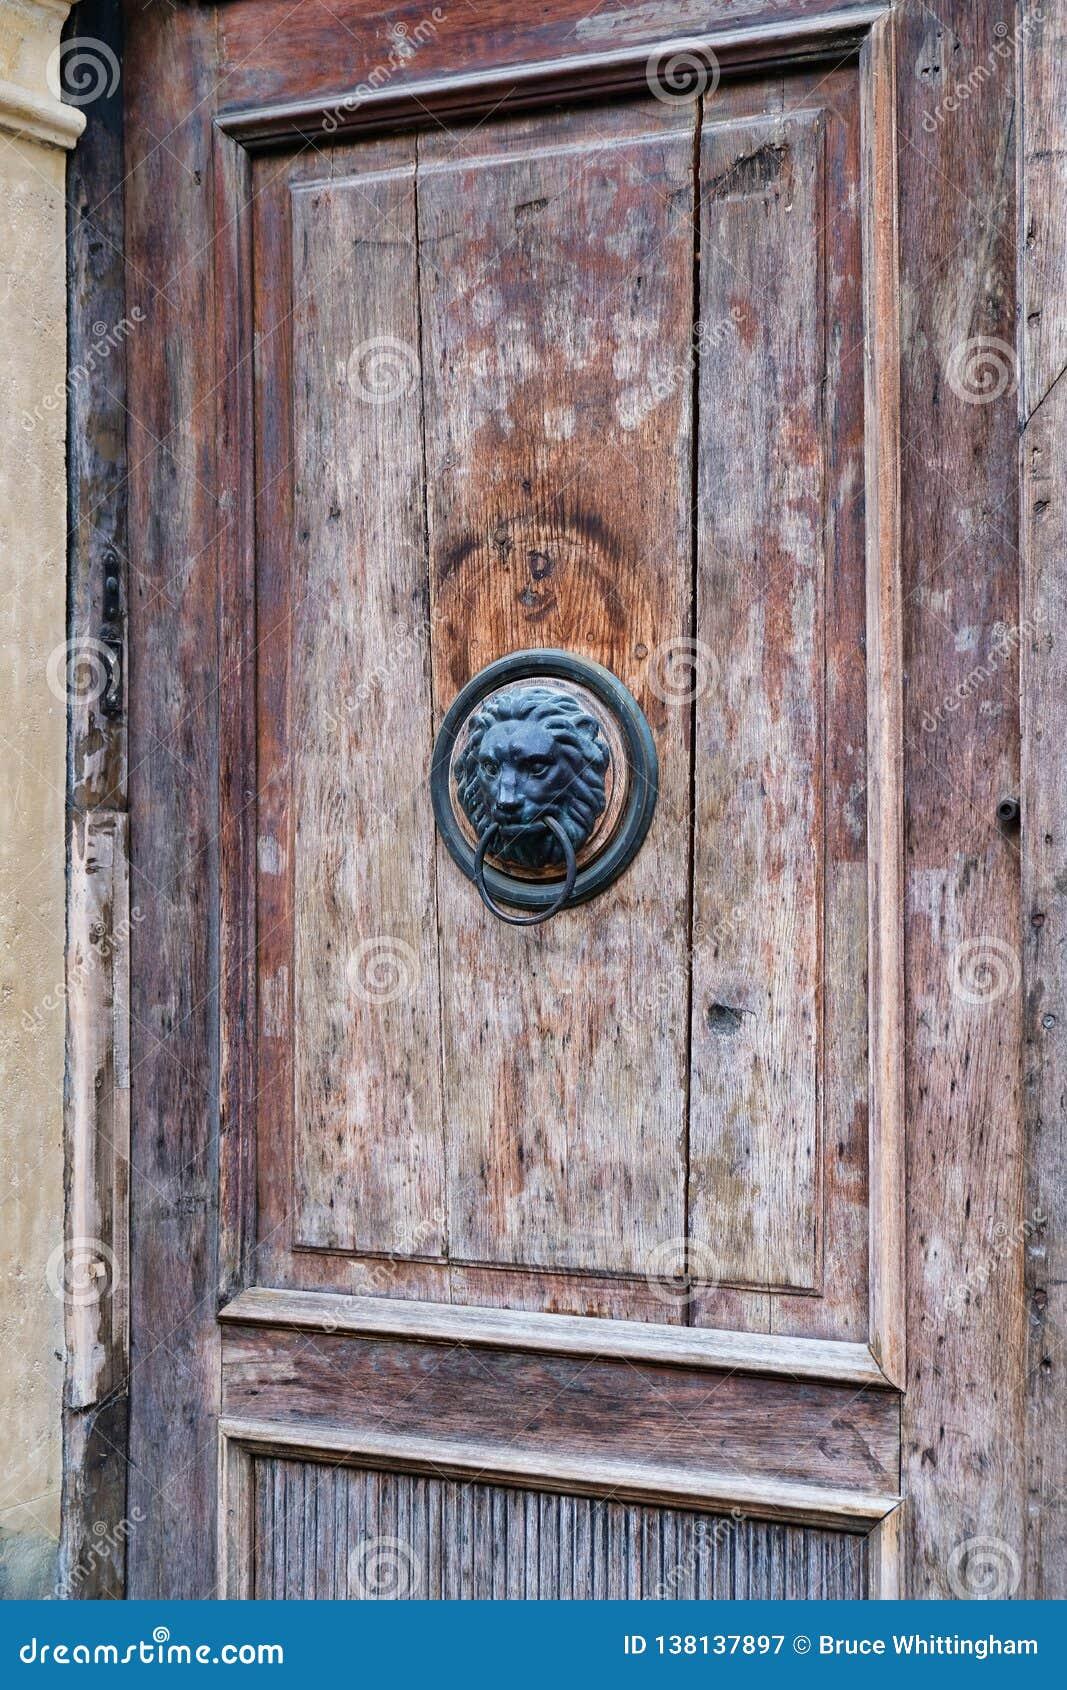 Lion Head Knocker on Old Wooden Door, Zagreb, Croatia